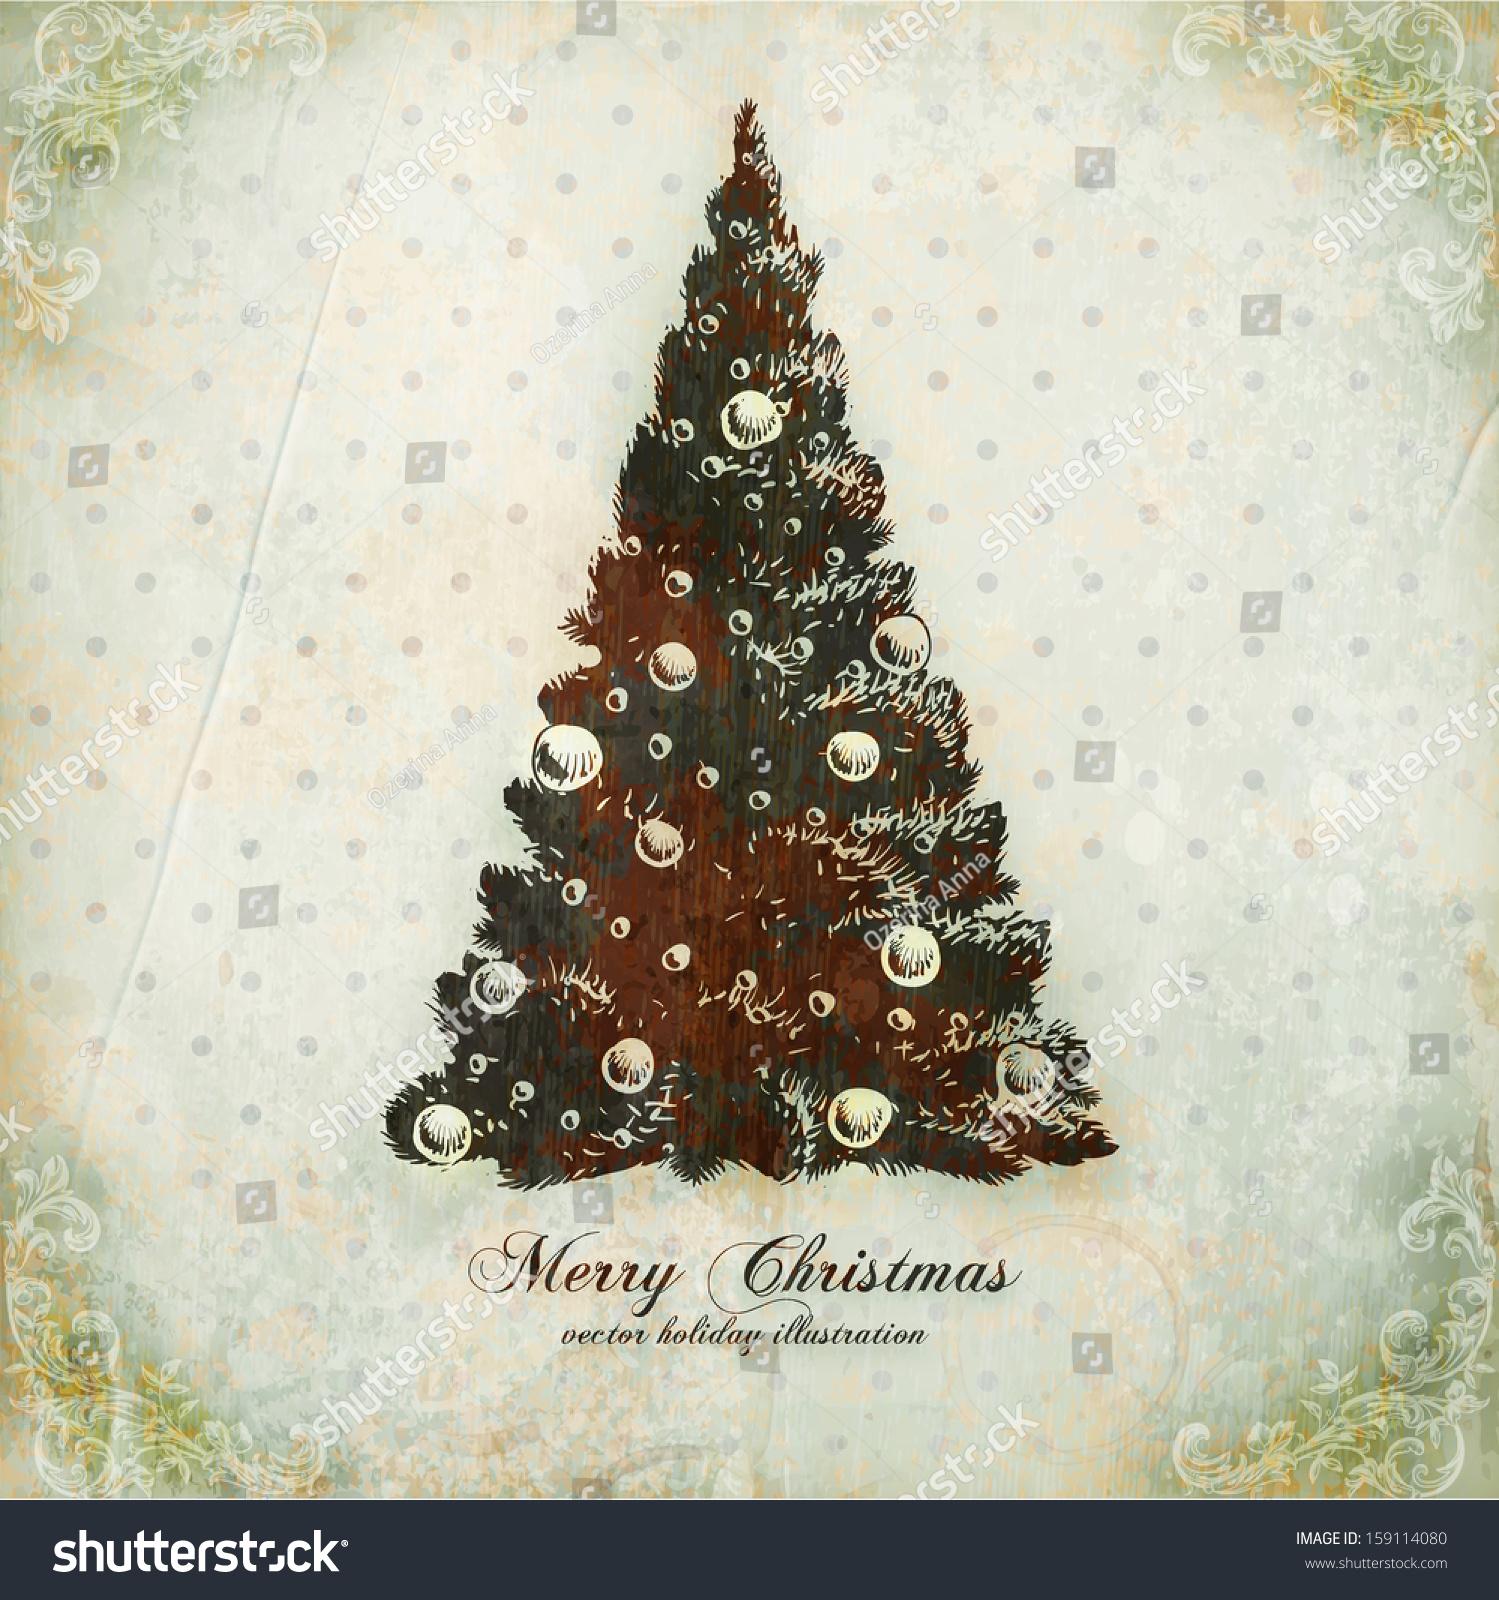 Christmas Tree Vintage Vector Xmas Card Stock Vector (Royalty Free ...